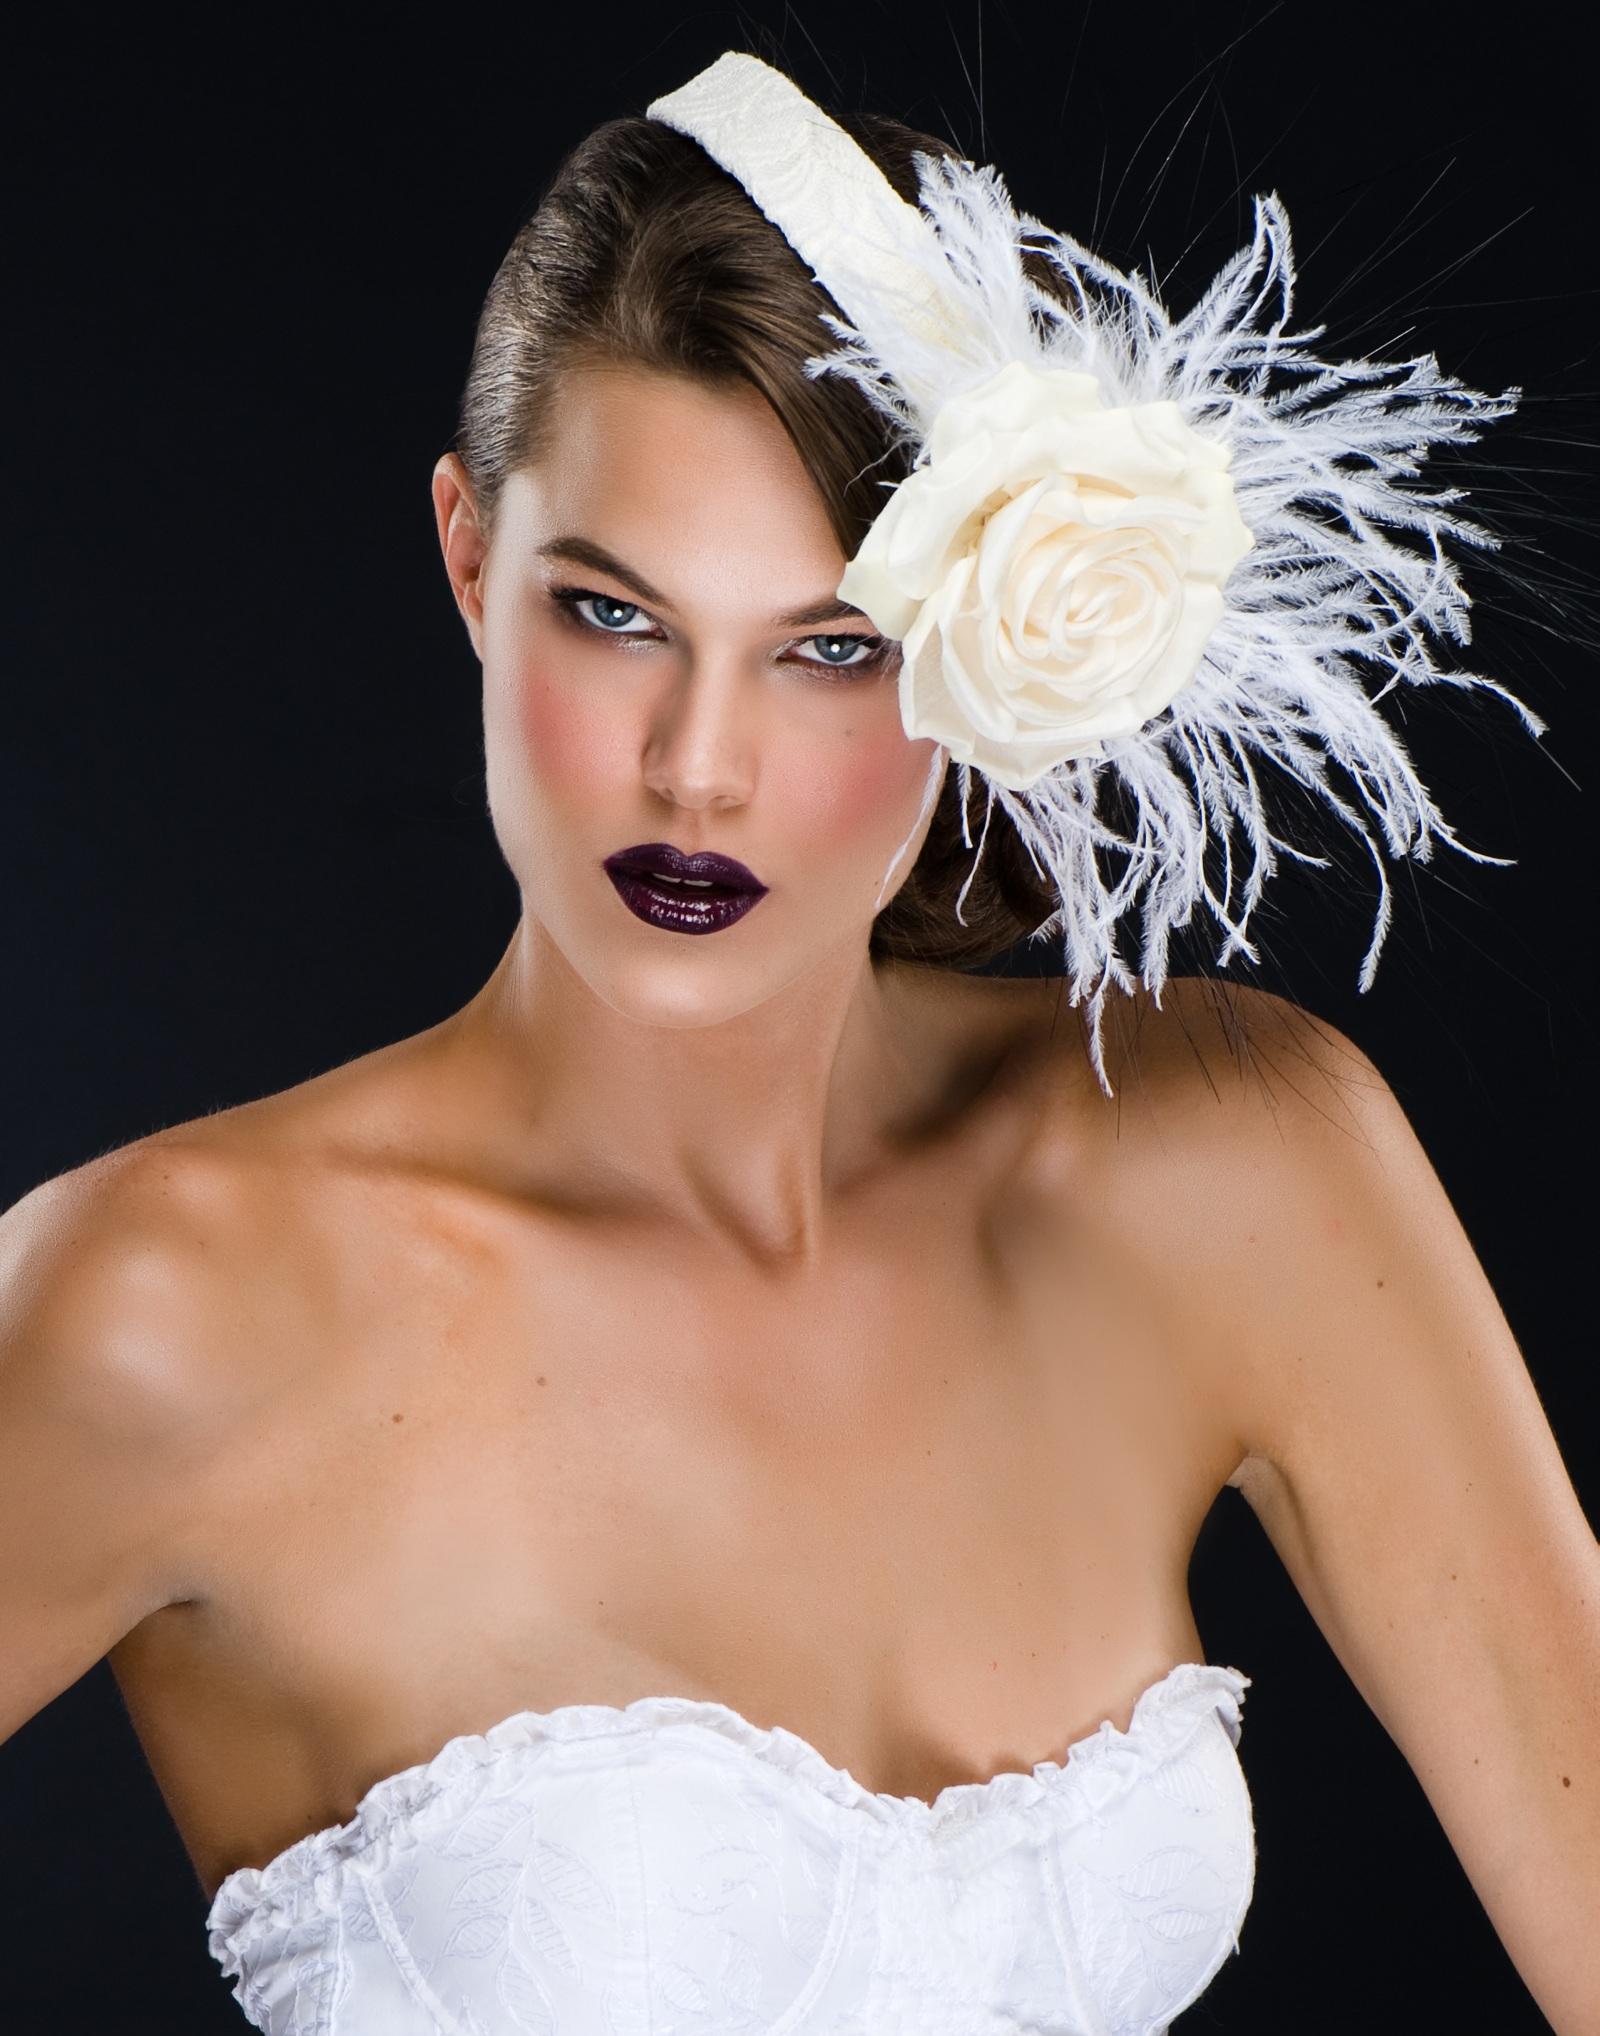 Hat designer: Arturo Rios  Photographer: Mark Sacro